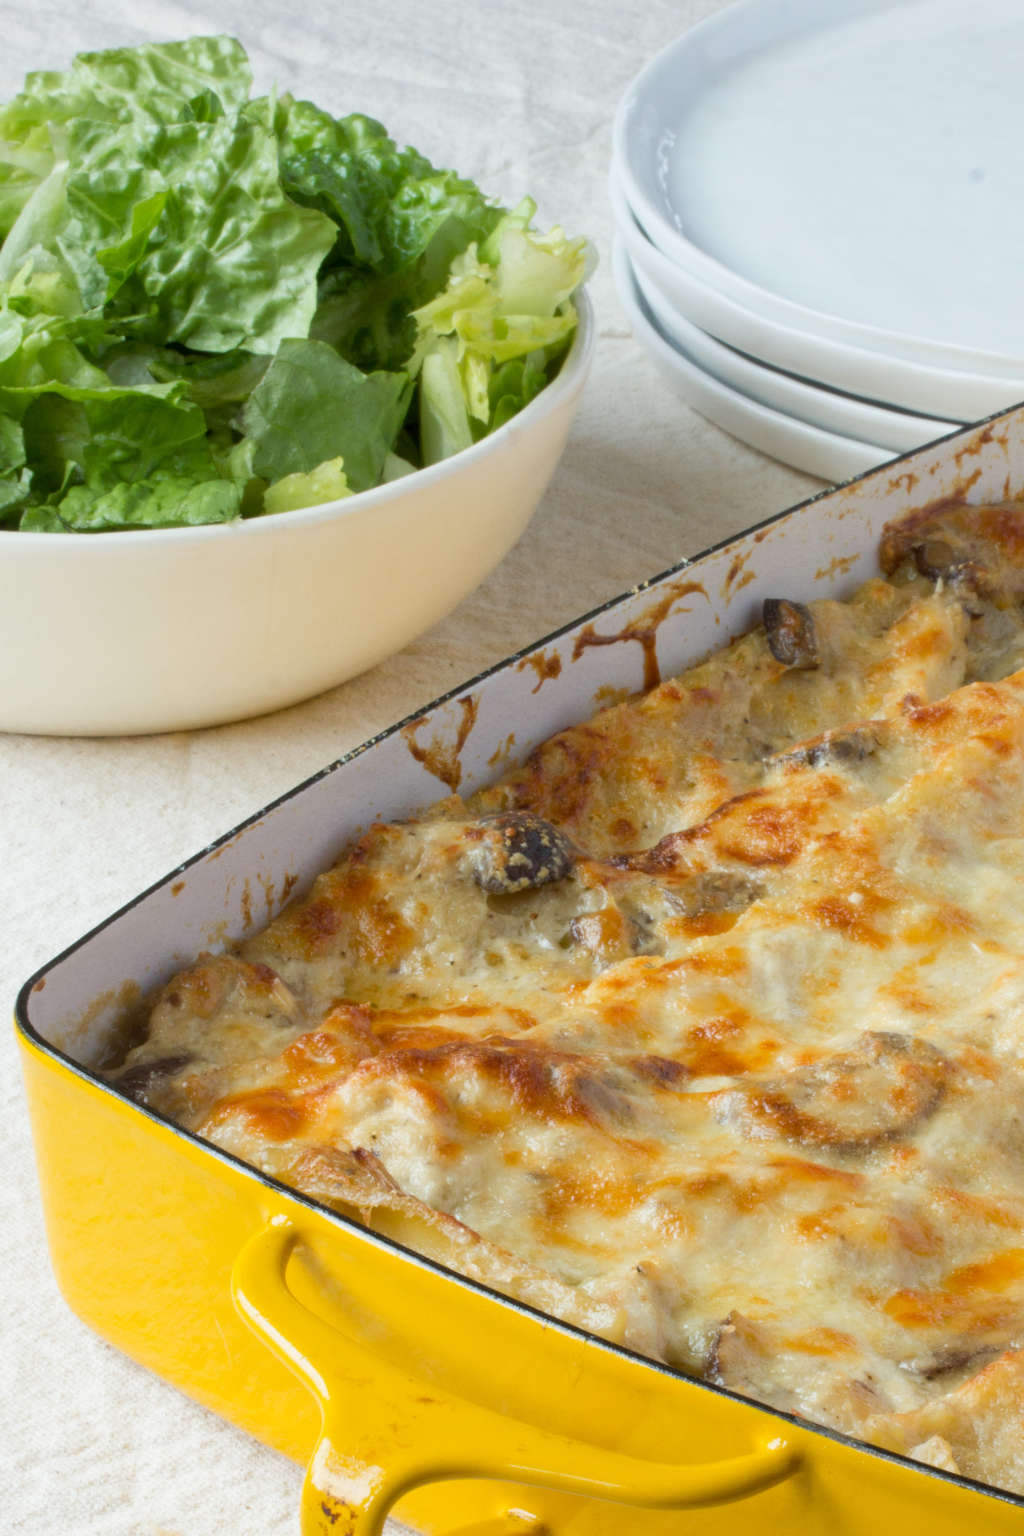 Cold Weather Recipe: Cheesy Chicken and Mushroom Lasagna